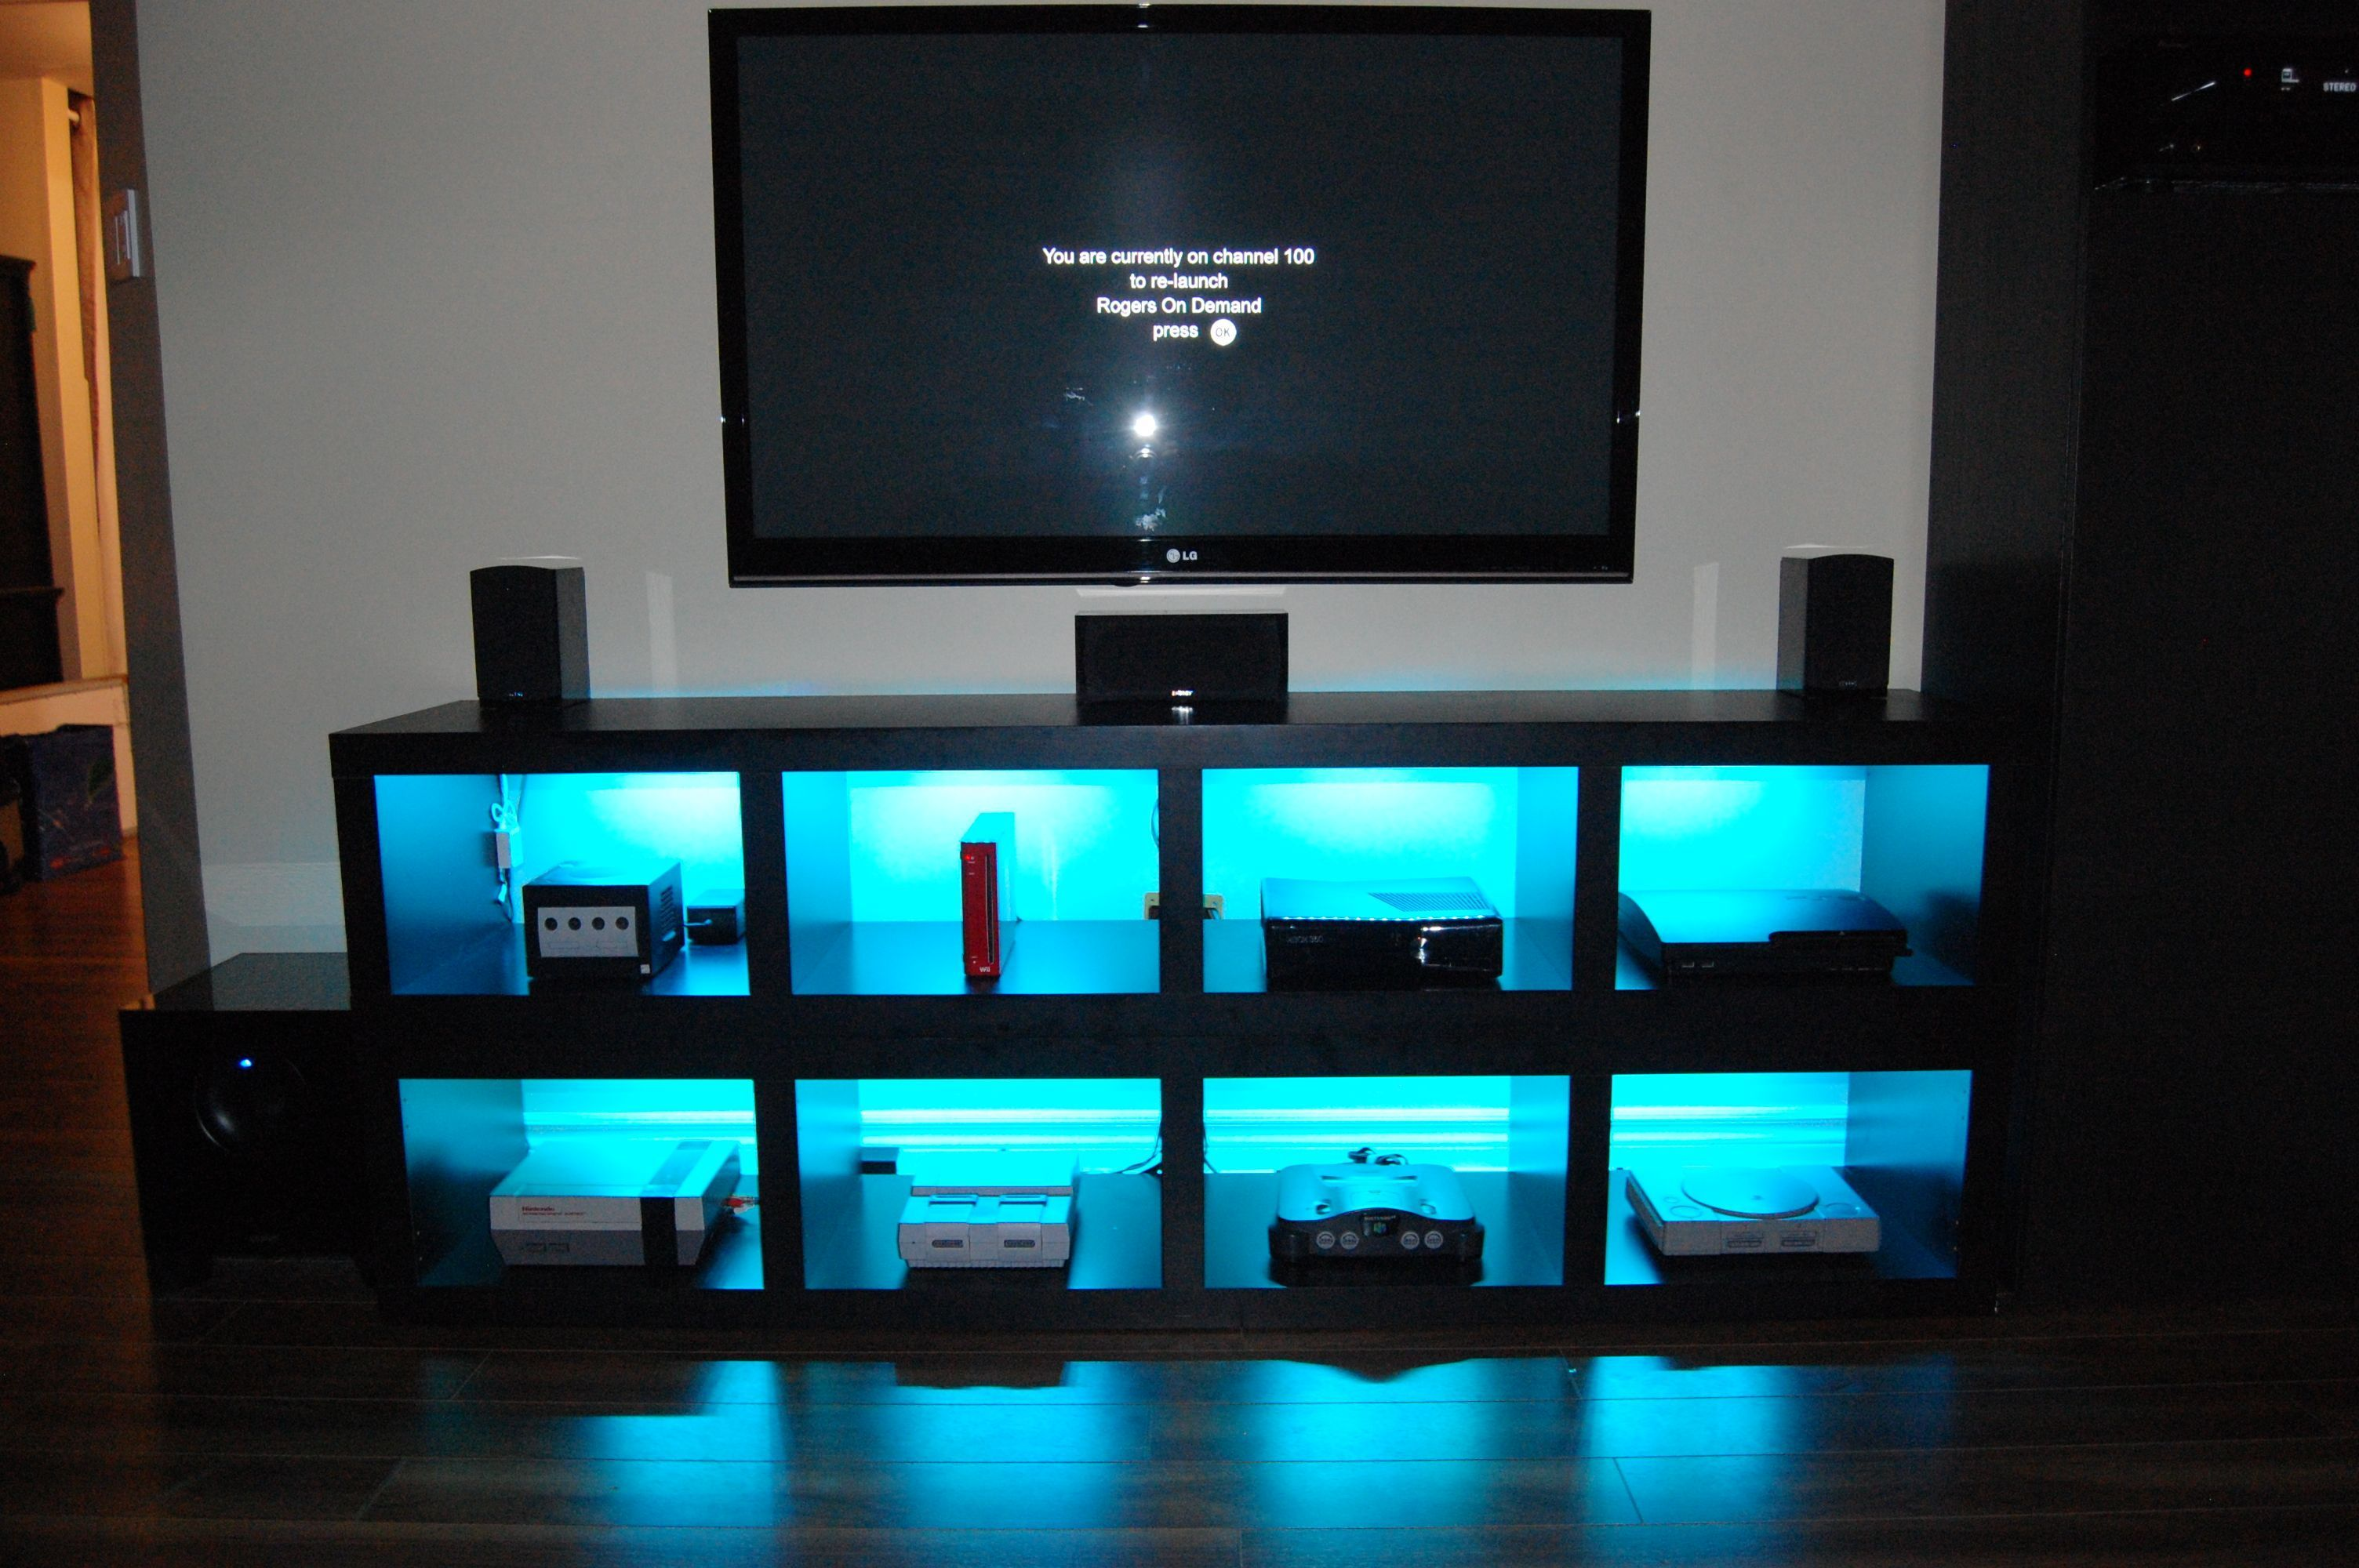 Basement Remodel On A Budget Basementremodelpaneling Video Game Rooms Game Room Design Game Room